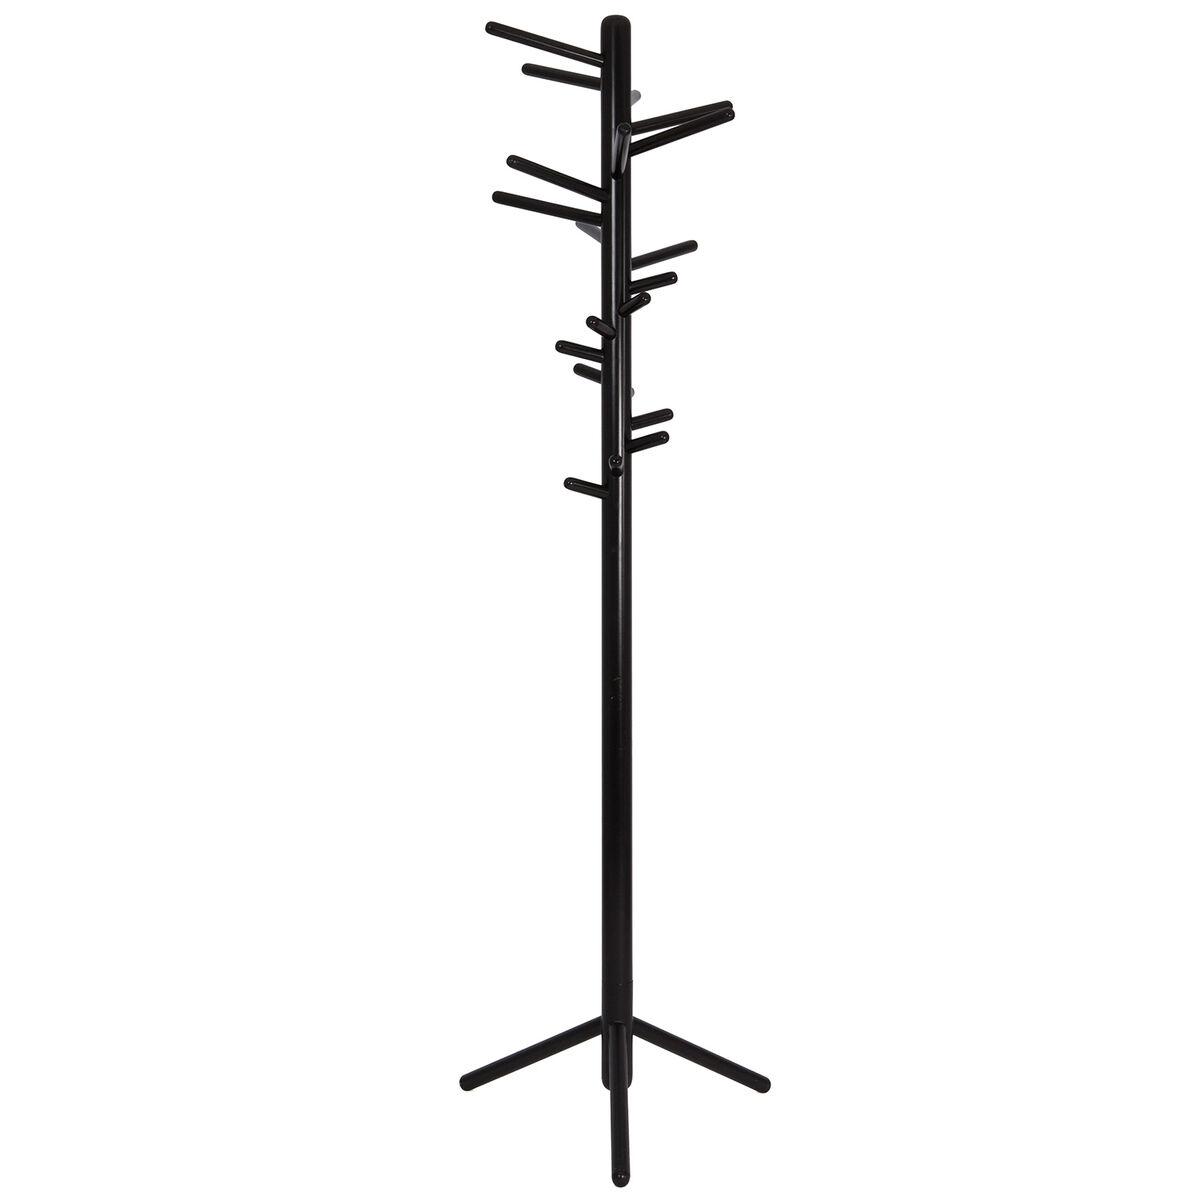 Artek 160 clothes tree, black